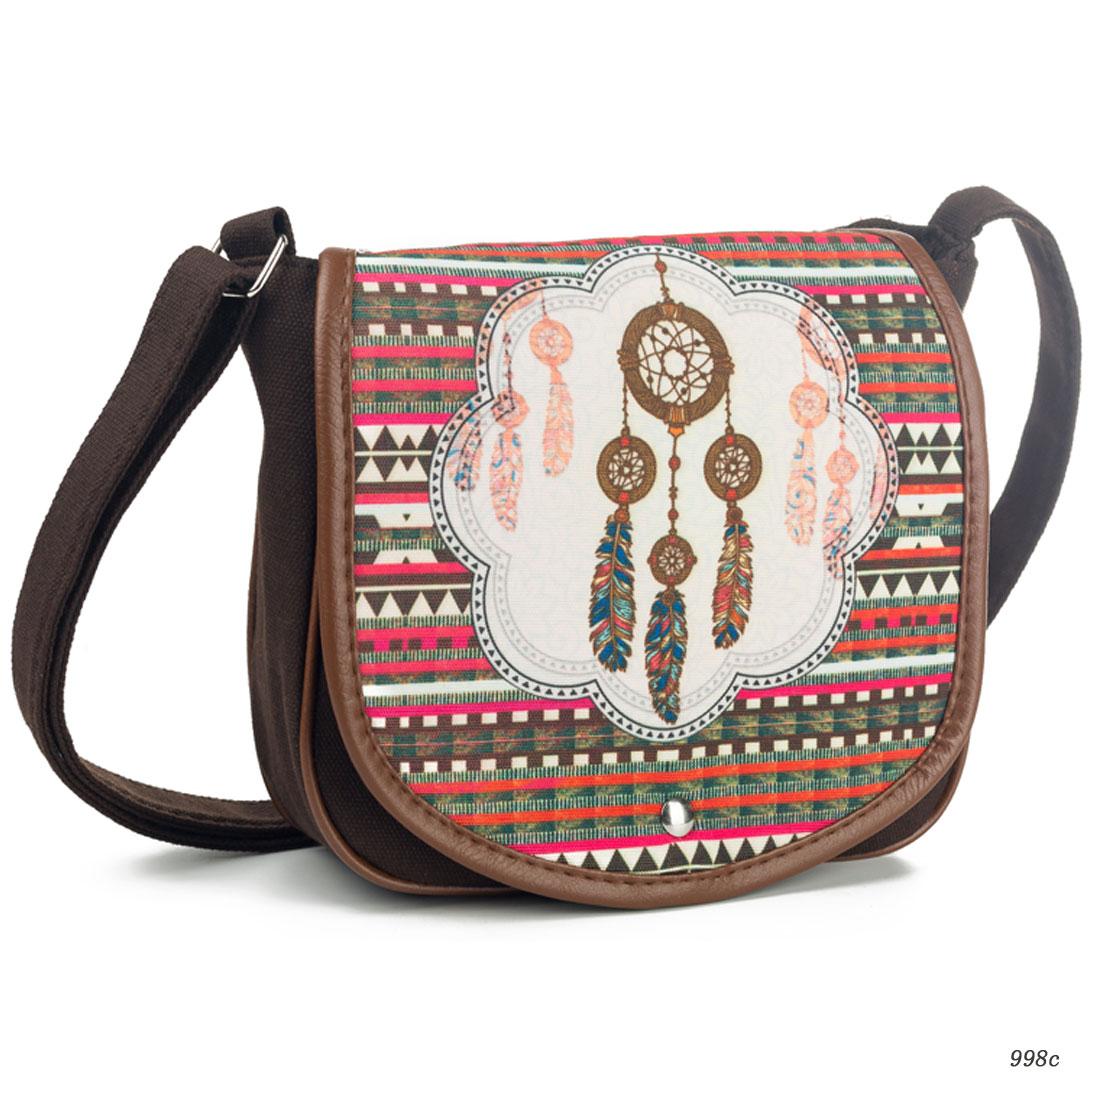 Wholesale Price Dropshipping Cheap Fashion Women Messenger Bag Canvas Bag Printed Crossbody Bag Women Shoulder Bag Embroidery